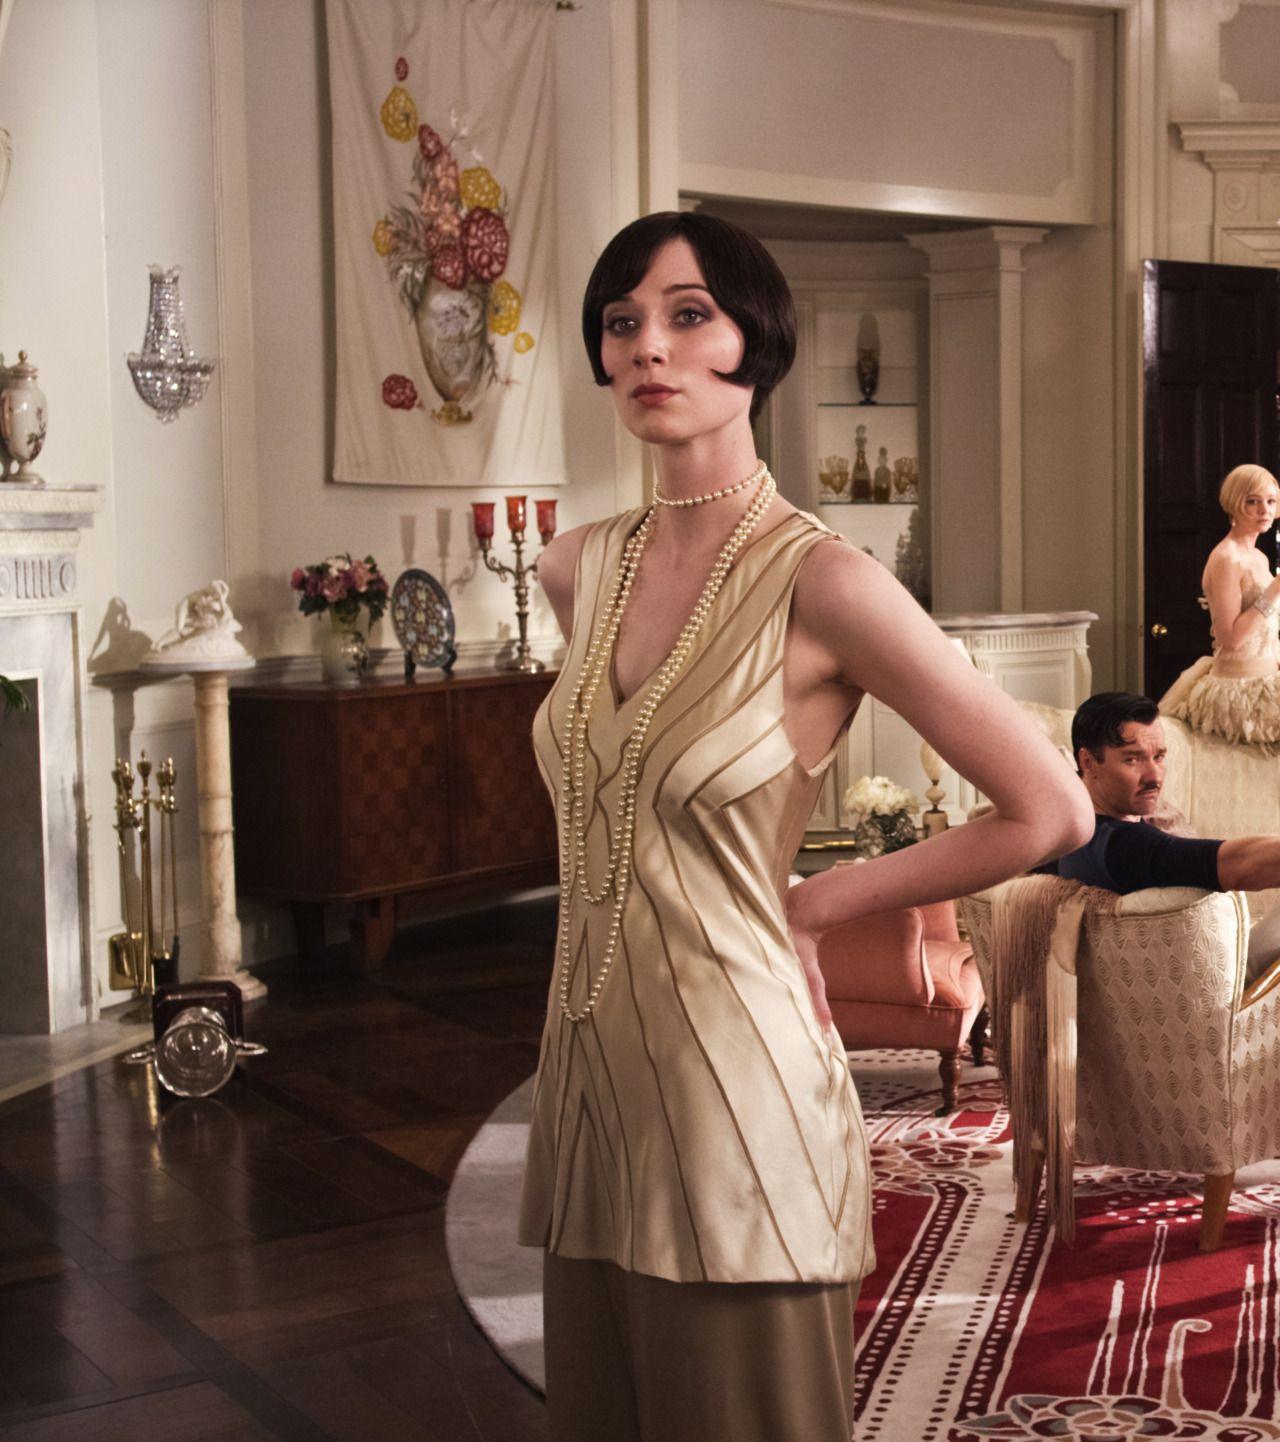 Elizabeth Debicki As Jordan Baker For Baz Luhrmann S The Great Gatsby 004 01 Bigger Great Gatsby Fashion Elizabeth Debicki Jordan Baker